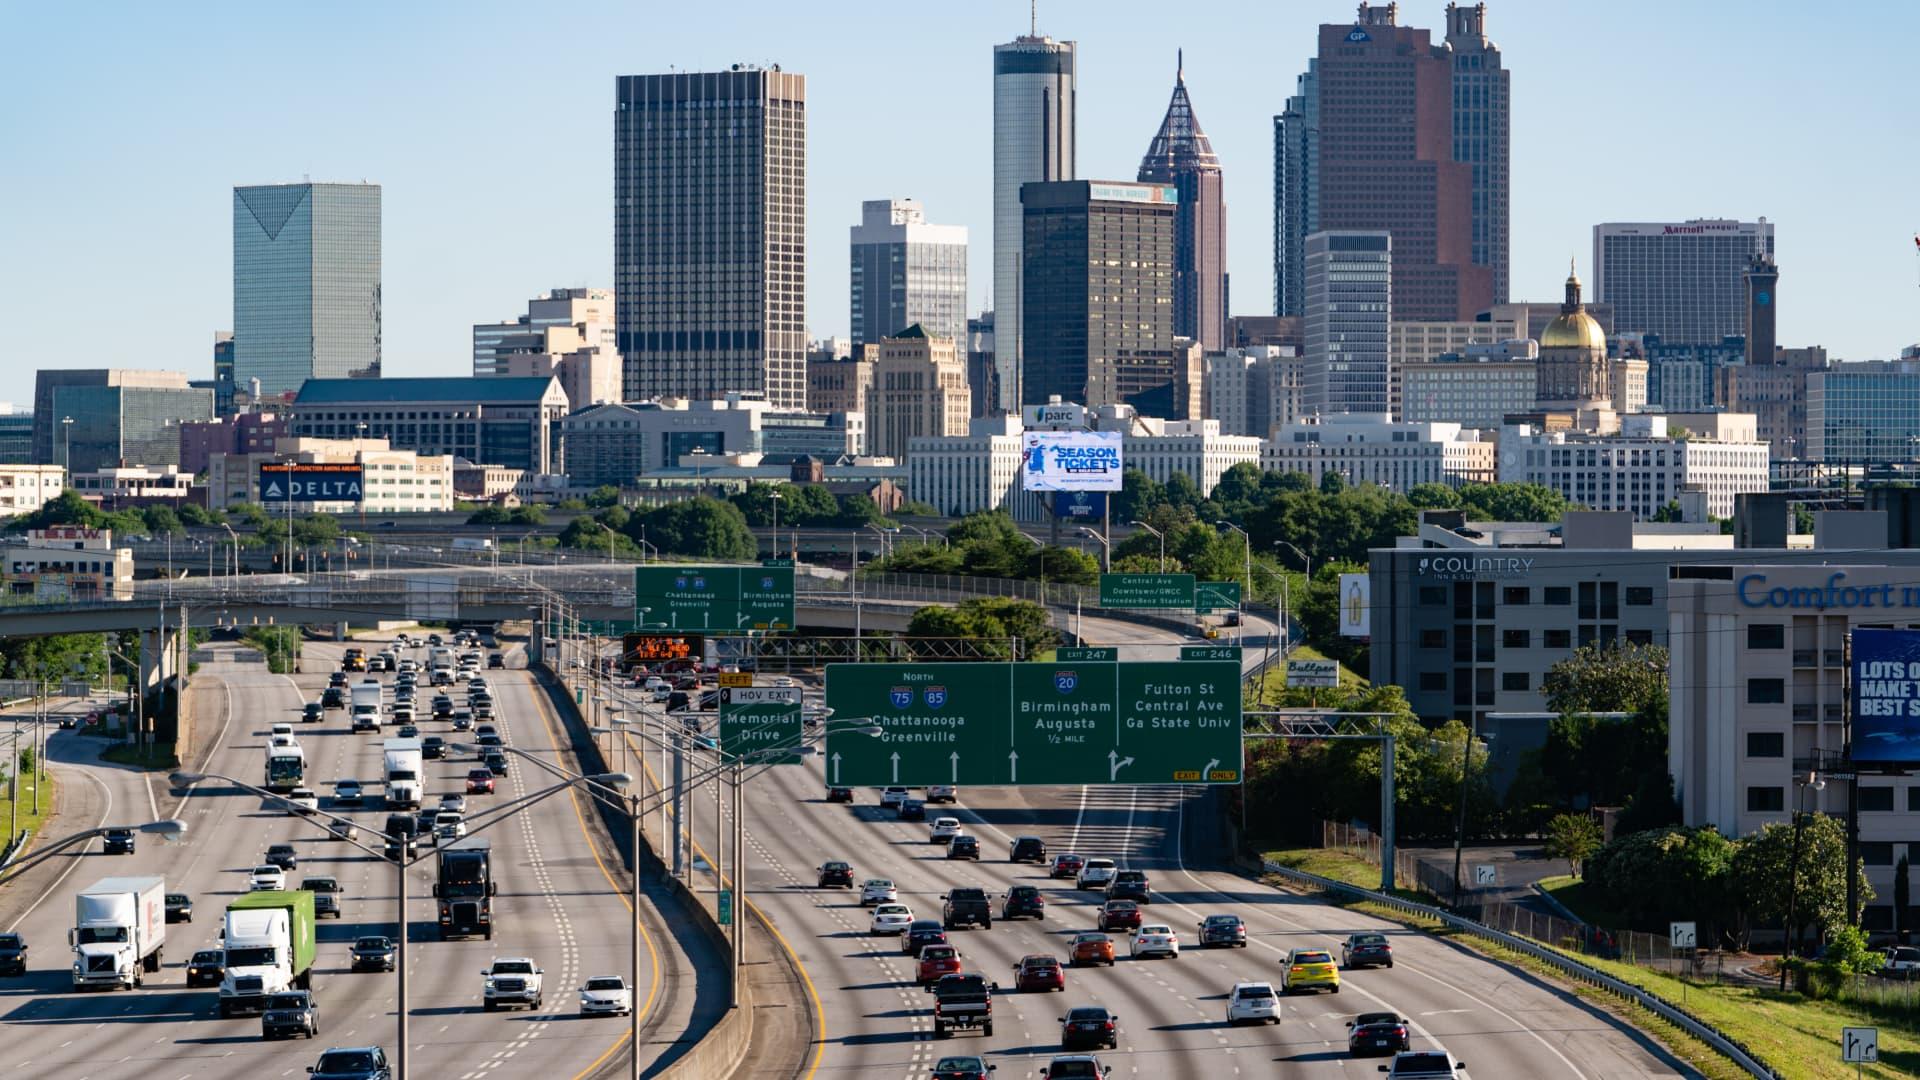 Traffic on Interstate 85 in Atlanta, Georgia, U.S., on Thursday, May 13, 2021.